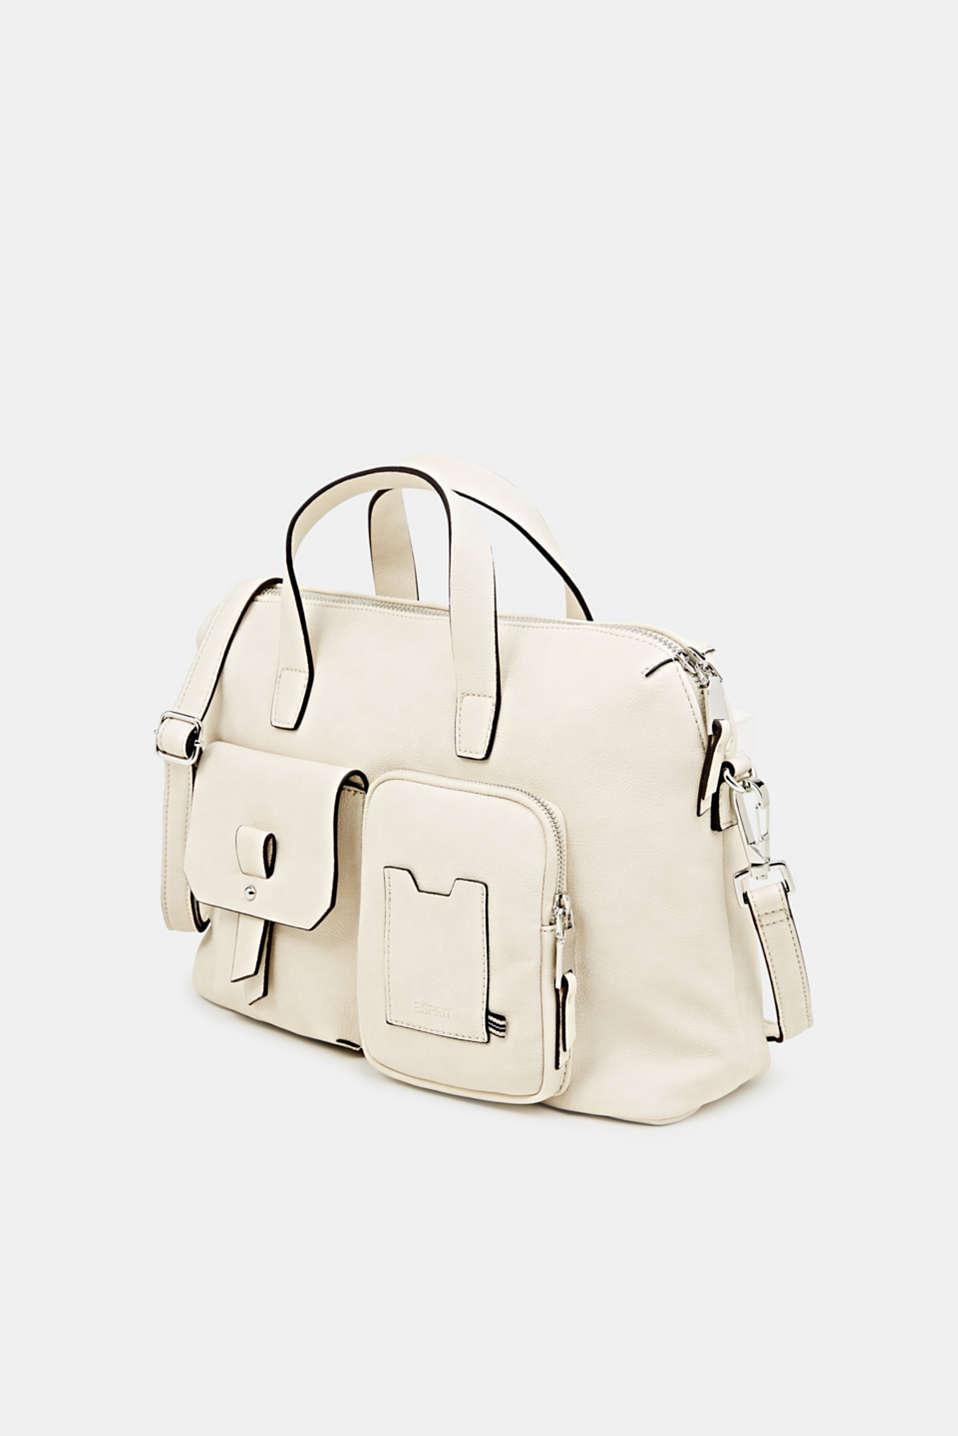 Faux leather handbag, CREAM BEIGE, detail image number 2